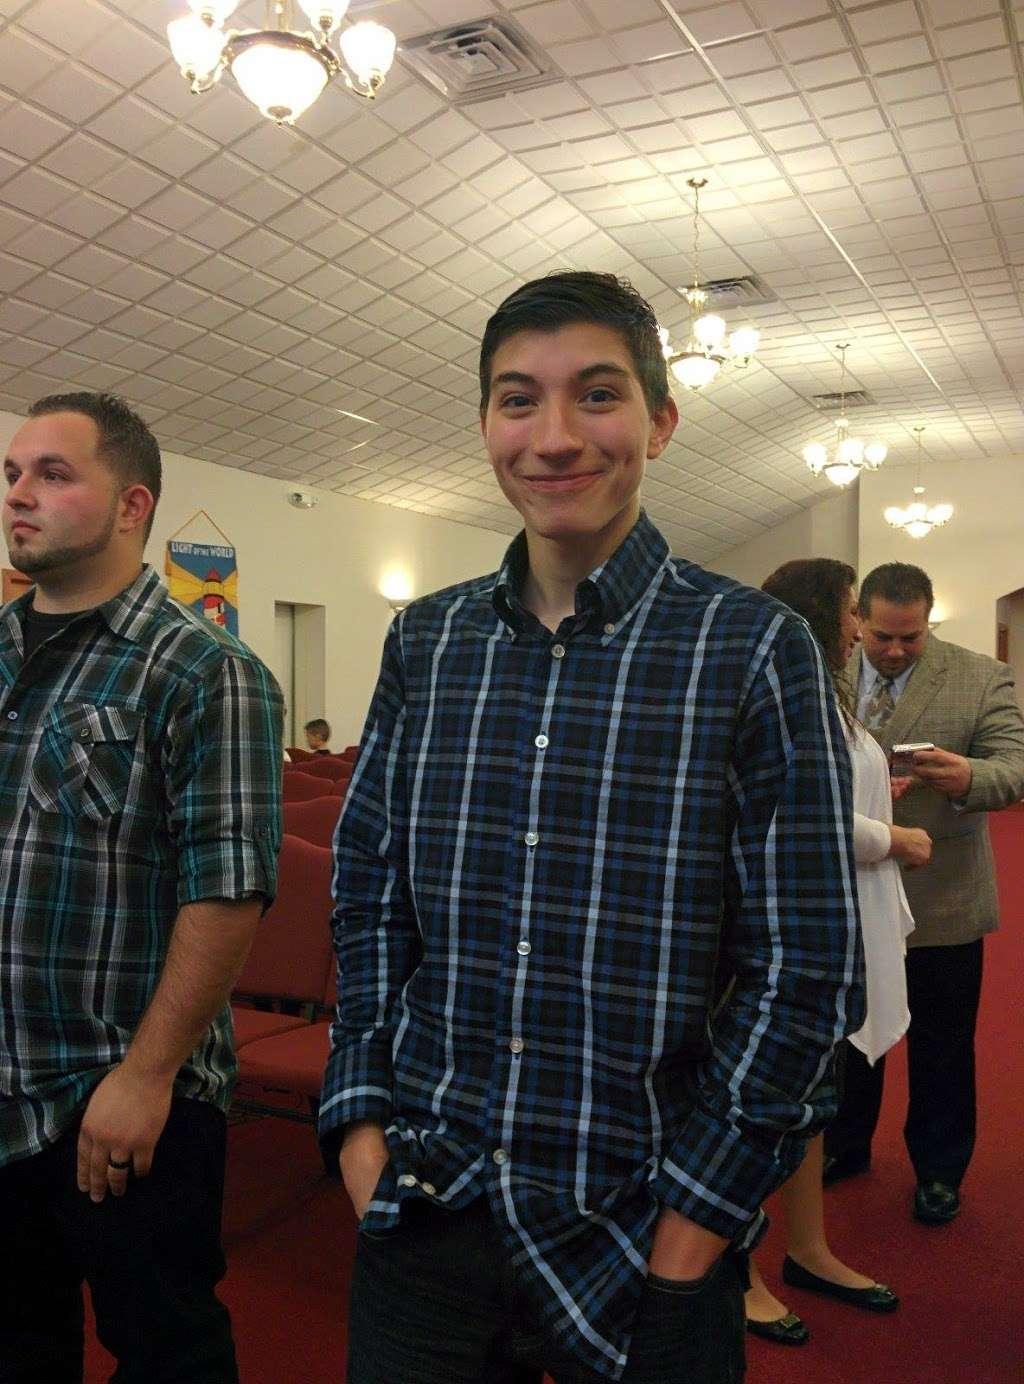 Apostolic Missionary Church - church  | Photo 10 of 10 | Address: 2686 S 12th St, Milwaukee, WI 53215, USA | Phone: (414) 645-7383